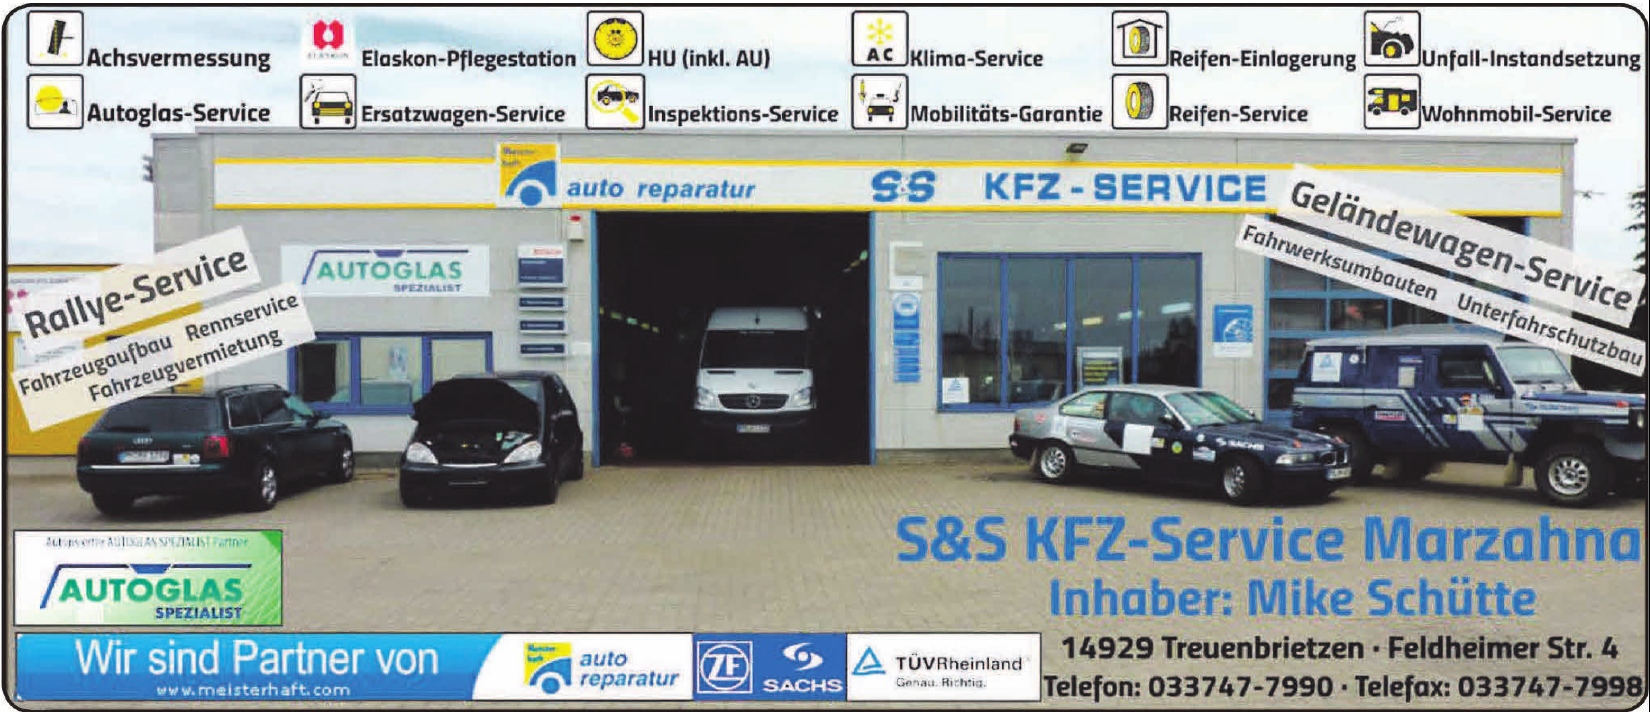 S&S Kfz-Service Marzahna